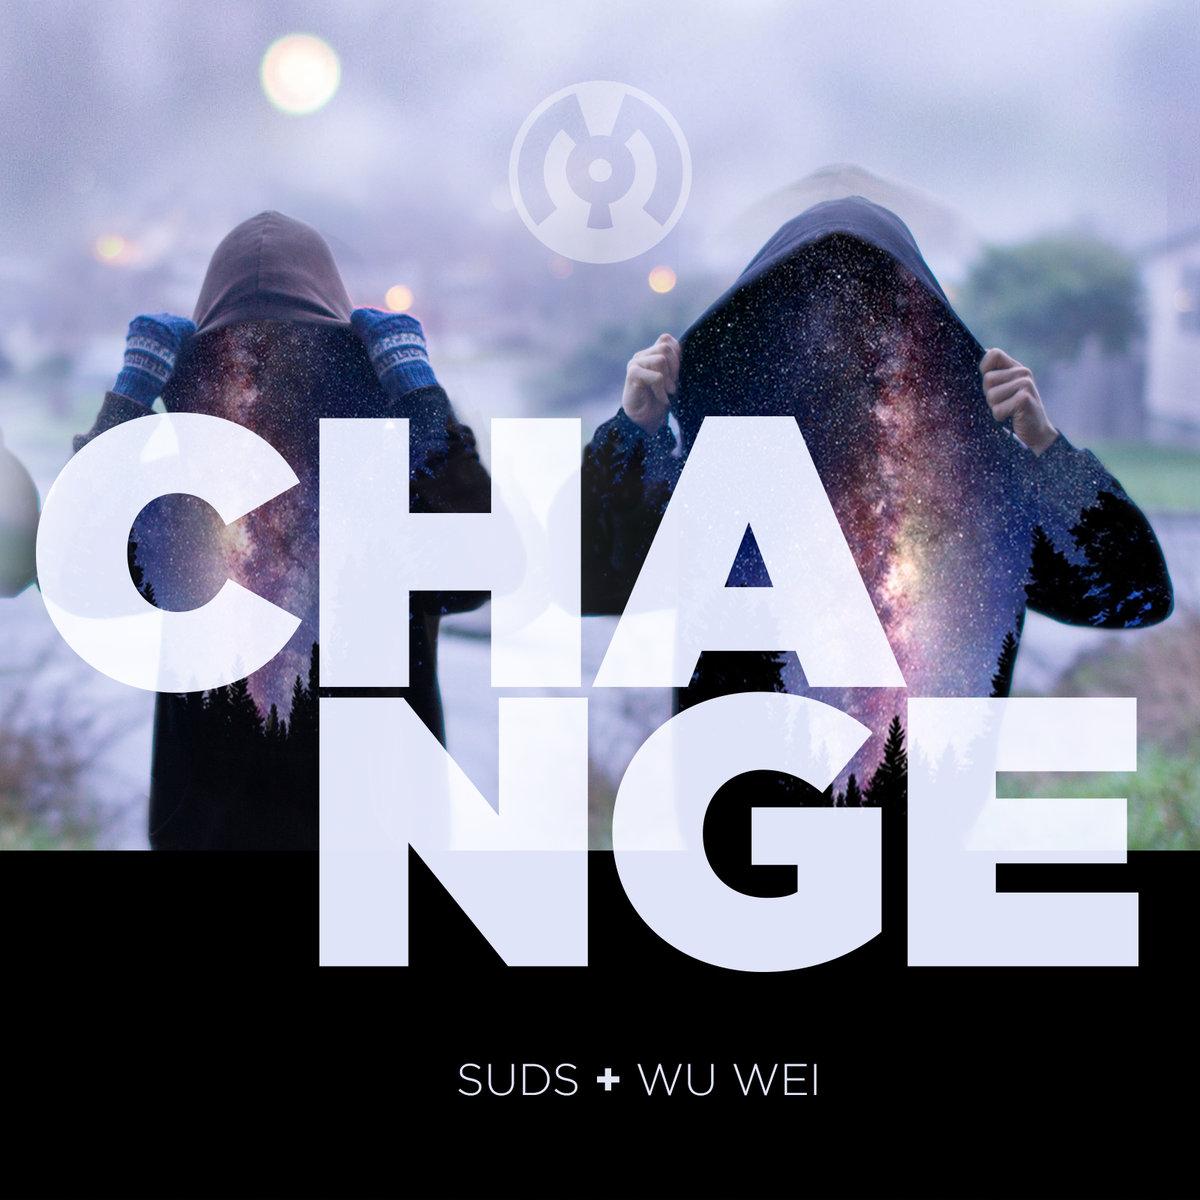 SuDs & Wu Wei - Change @ 'Change' album (electronic, dubstep)